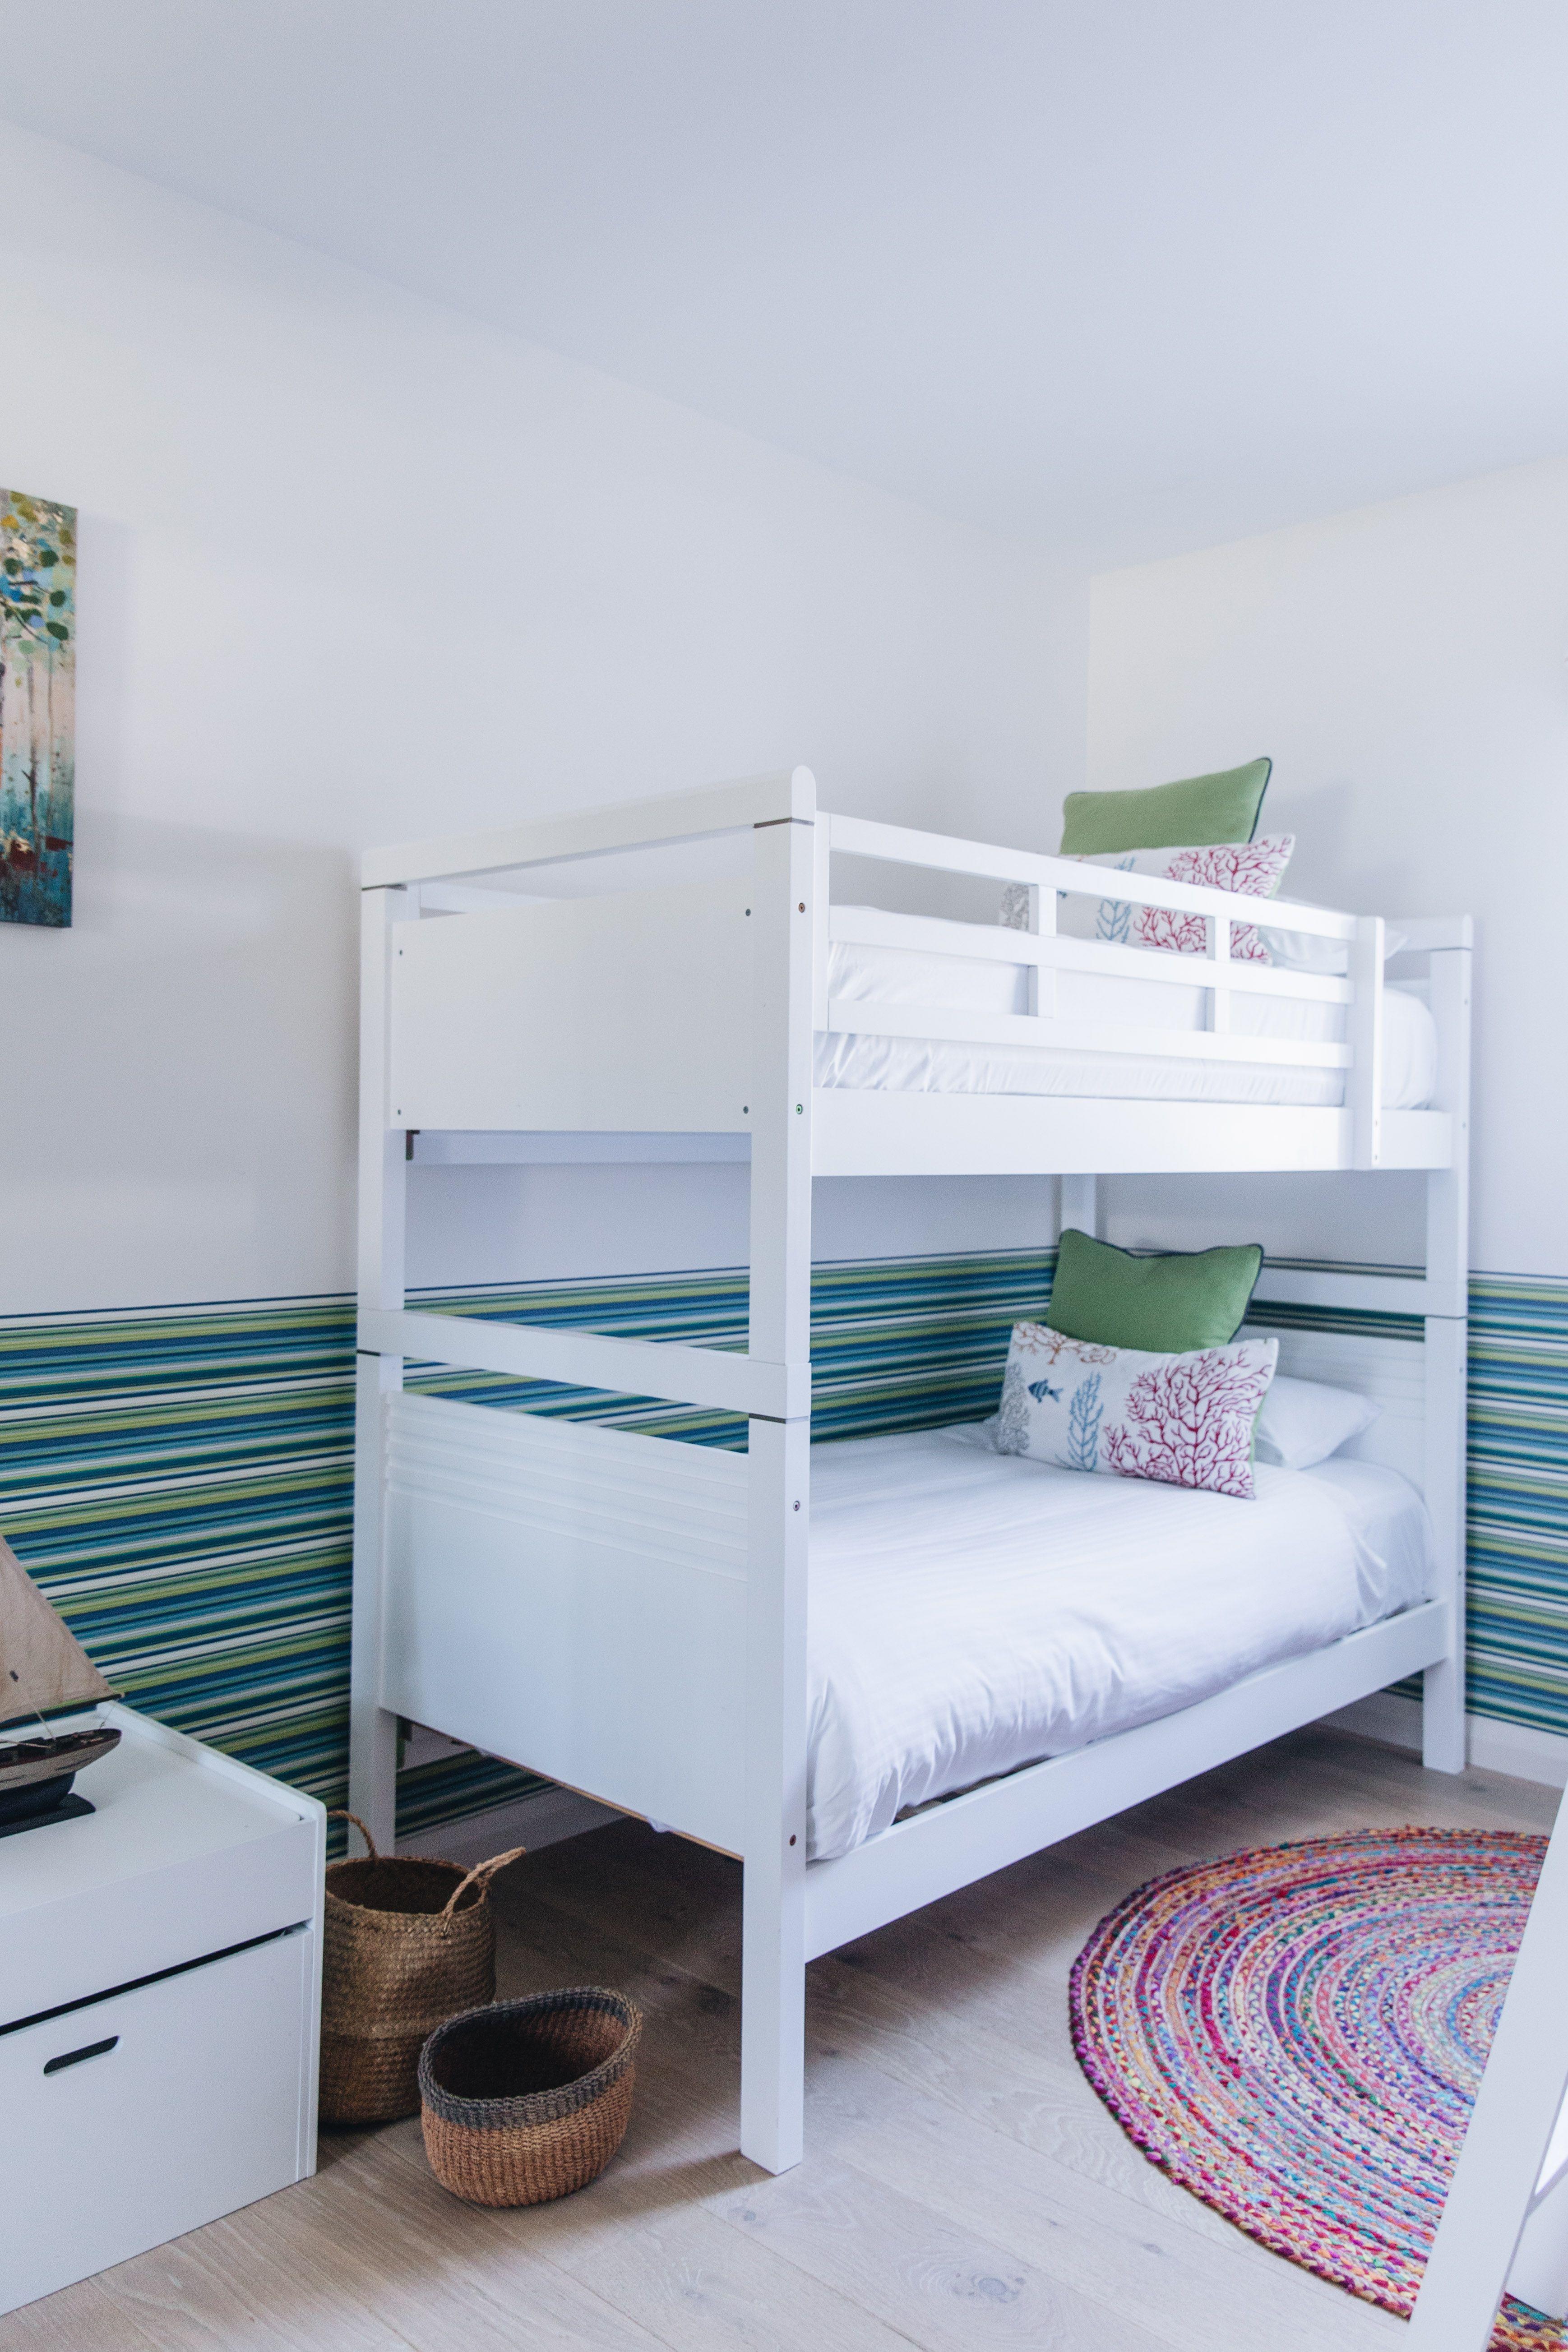 Designing A Child S Bedroom Part 1 Kid Beds Bunk Beds Kids